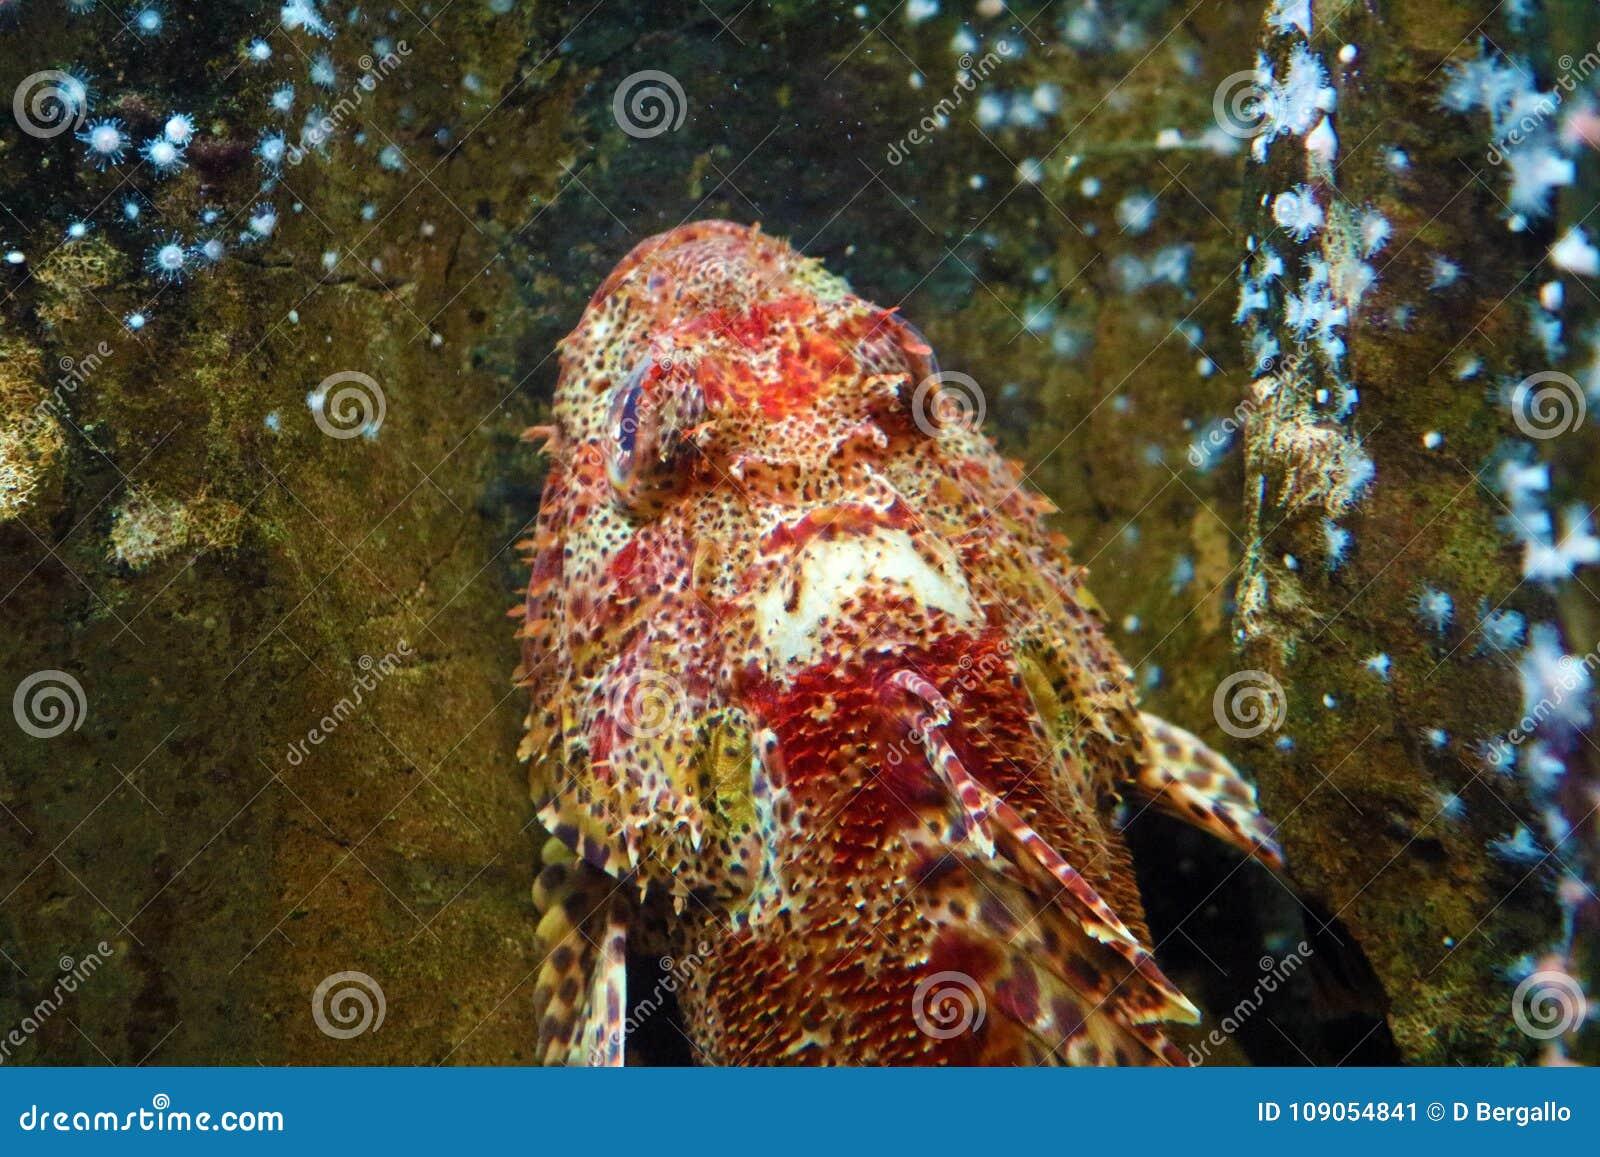 Coral Reef Weird Fish 6